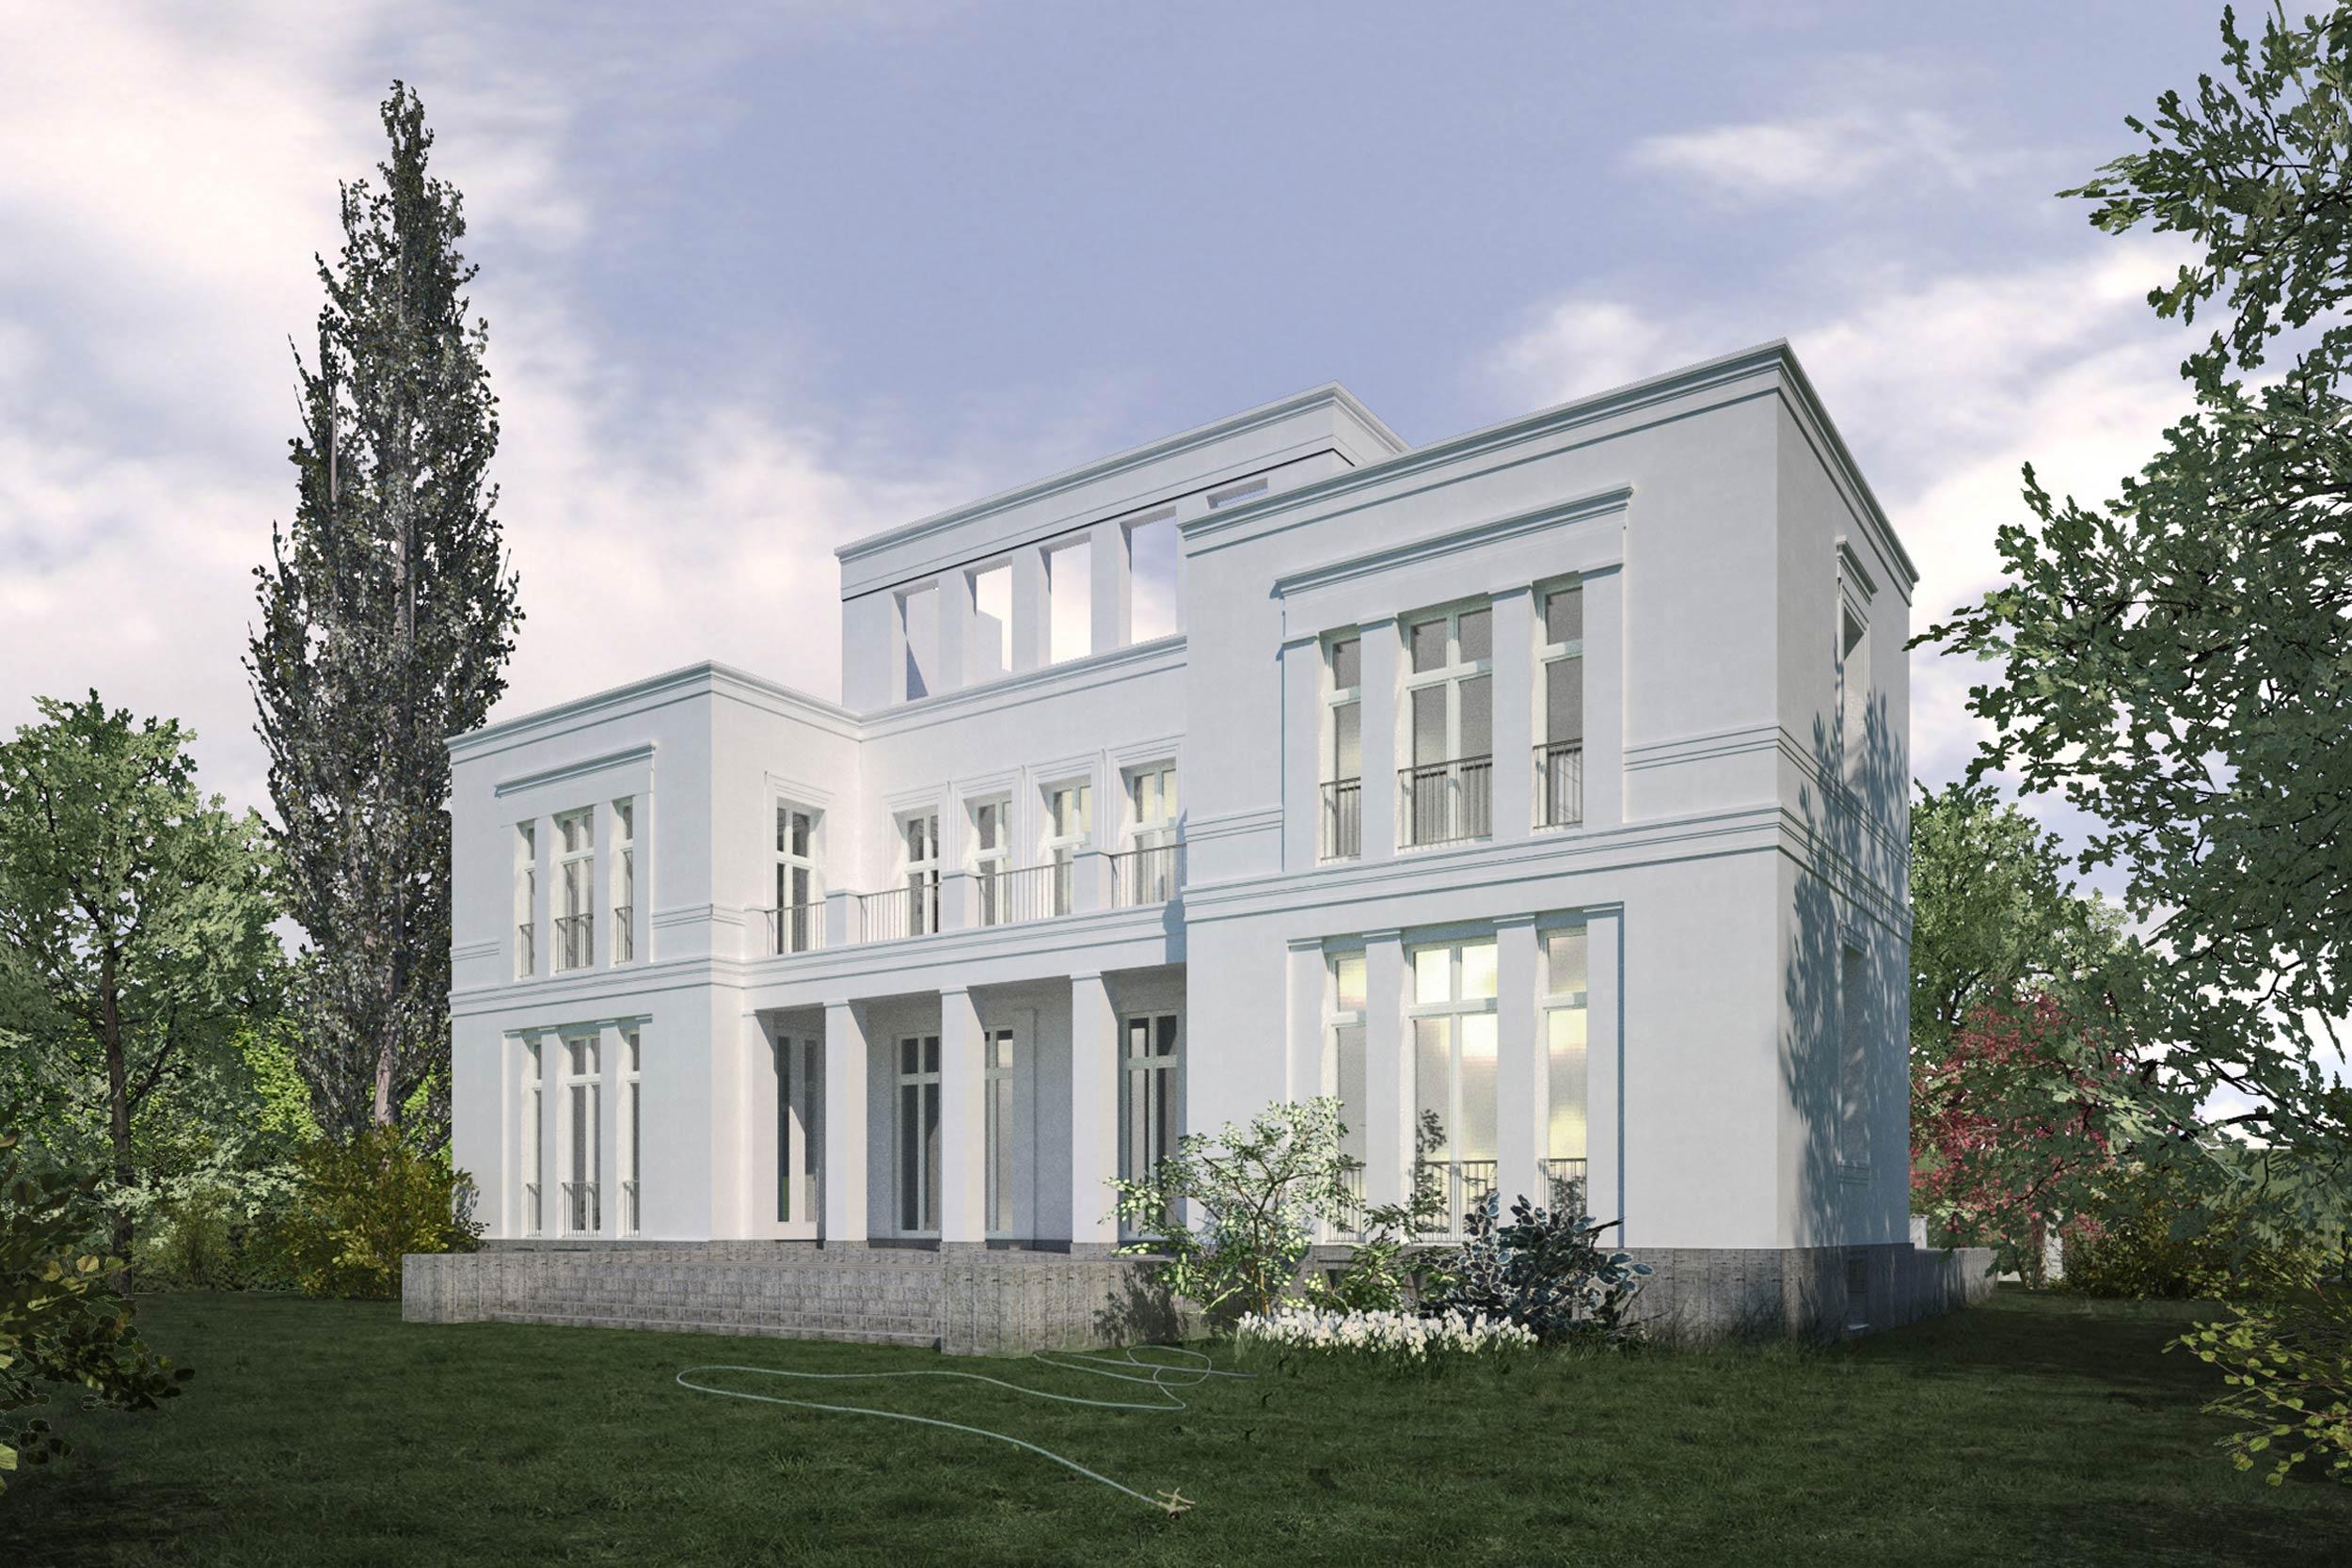 Errichtung klassischer Neubauvillen in Potsdam Jungfernseedivdiv class